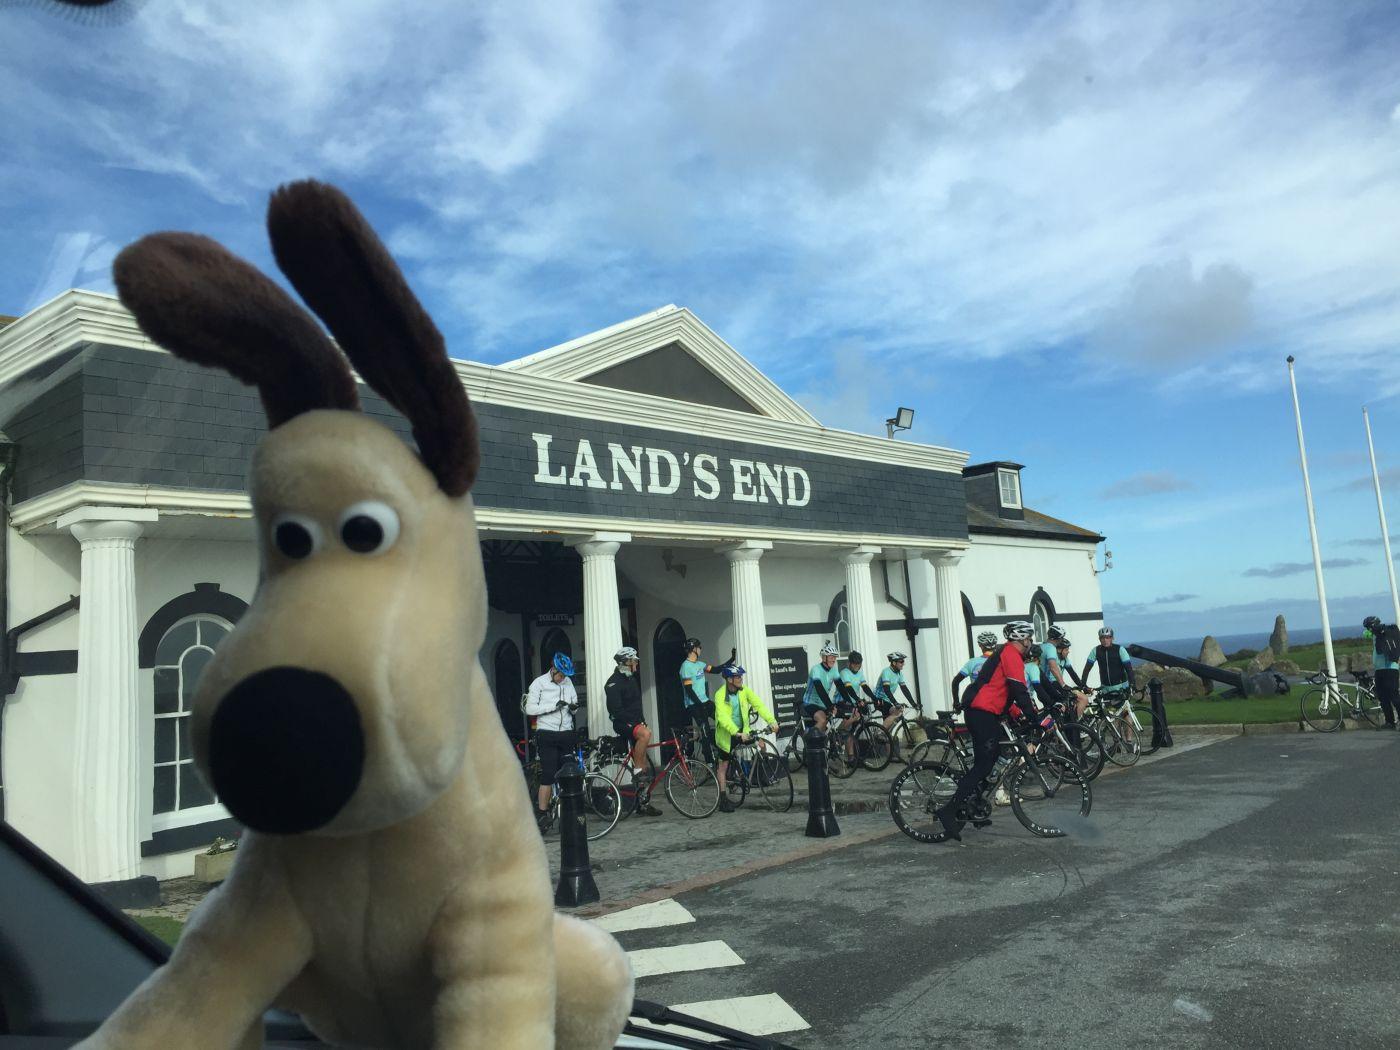 Aardman | Lands End to Bristol